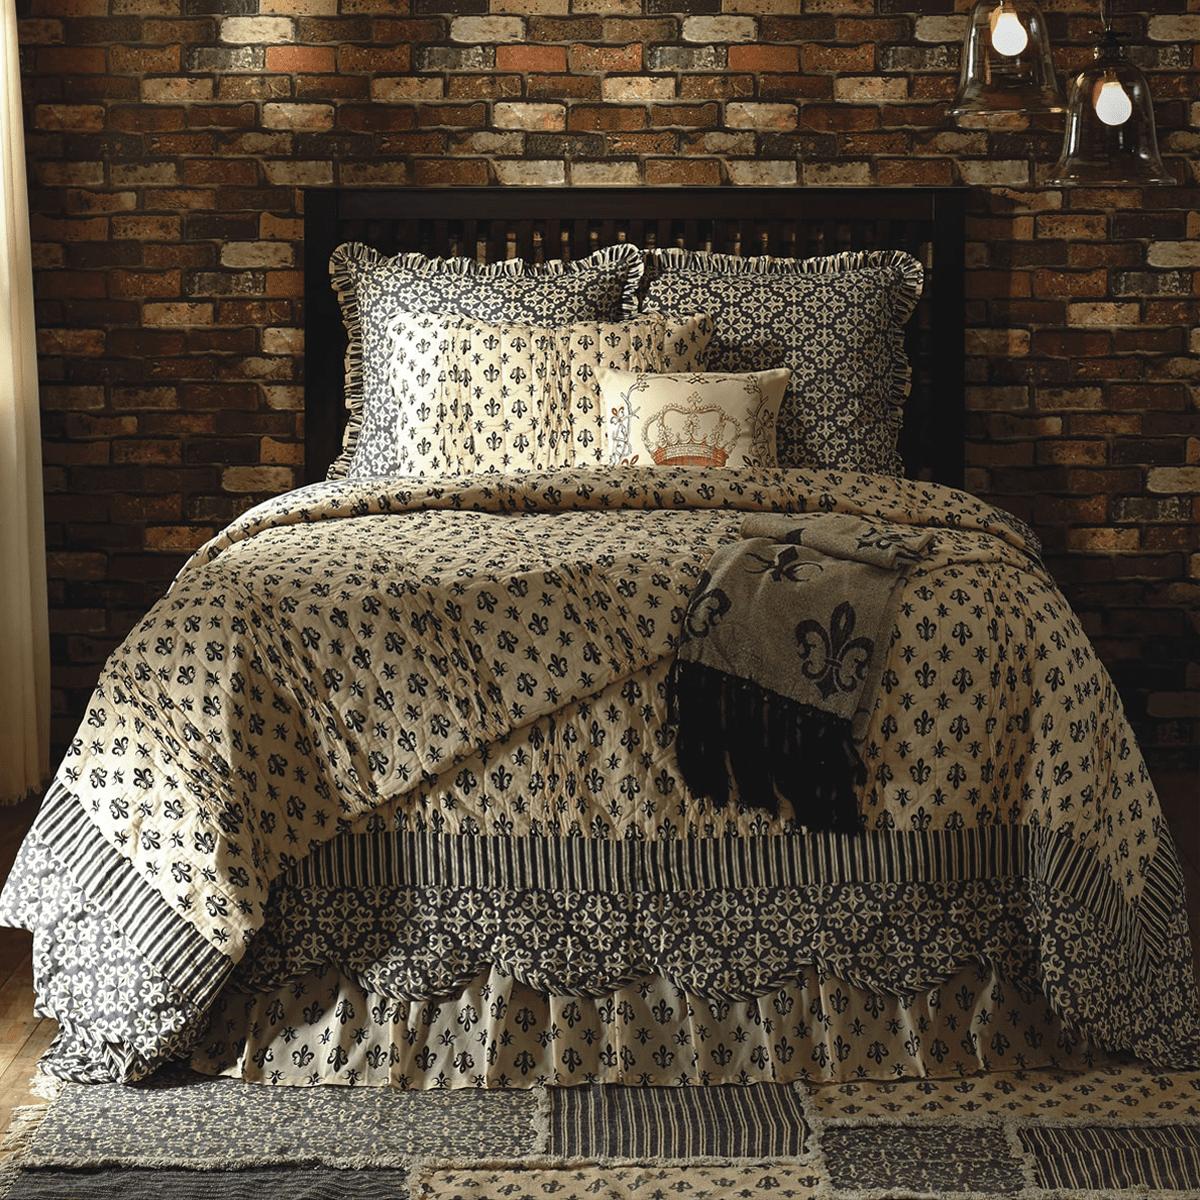 size redwood cover french sets fleur european lis comforter item set pattern bedding king home from vintage abstract culture renaissance de royal inspired gold duvet in